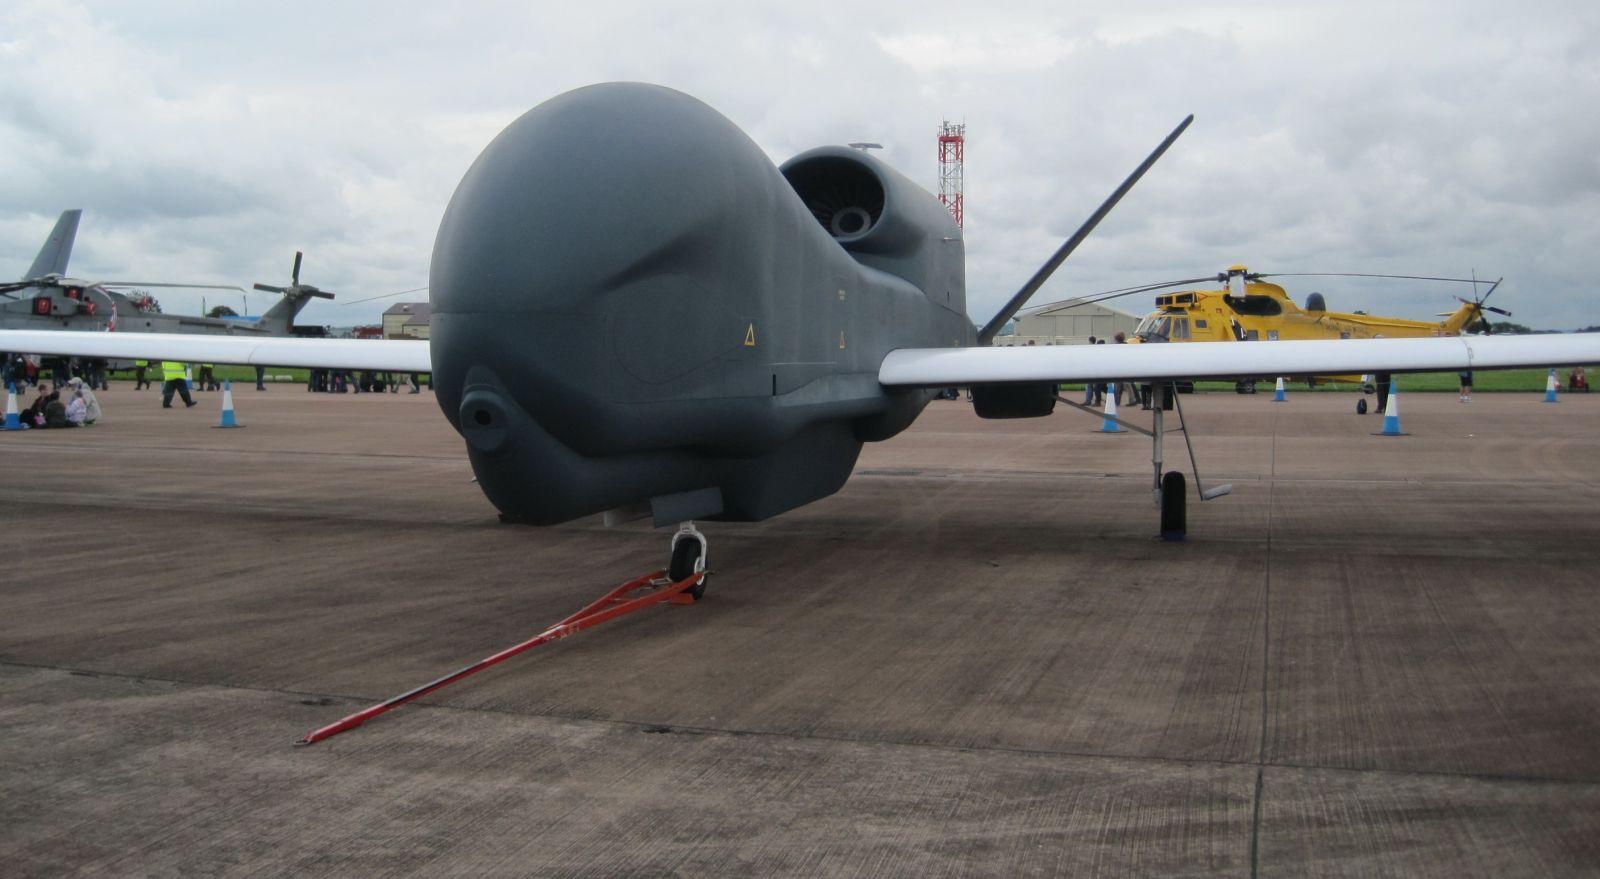 uav predator drone with 167 Mq 1 Predator Uav on 167 Mq 1 Predator Uav further Detail also 274177 furthermore Aerospace also Theuavdigest.